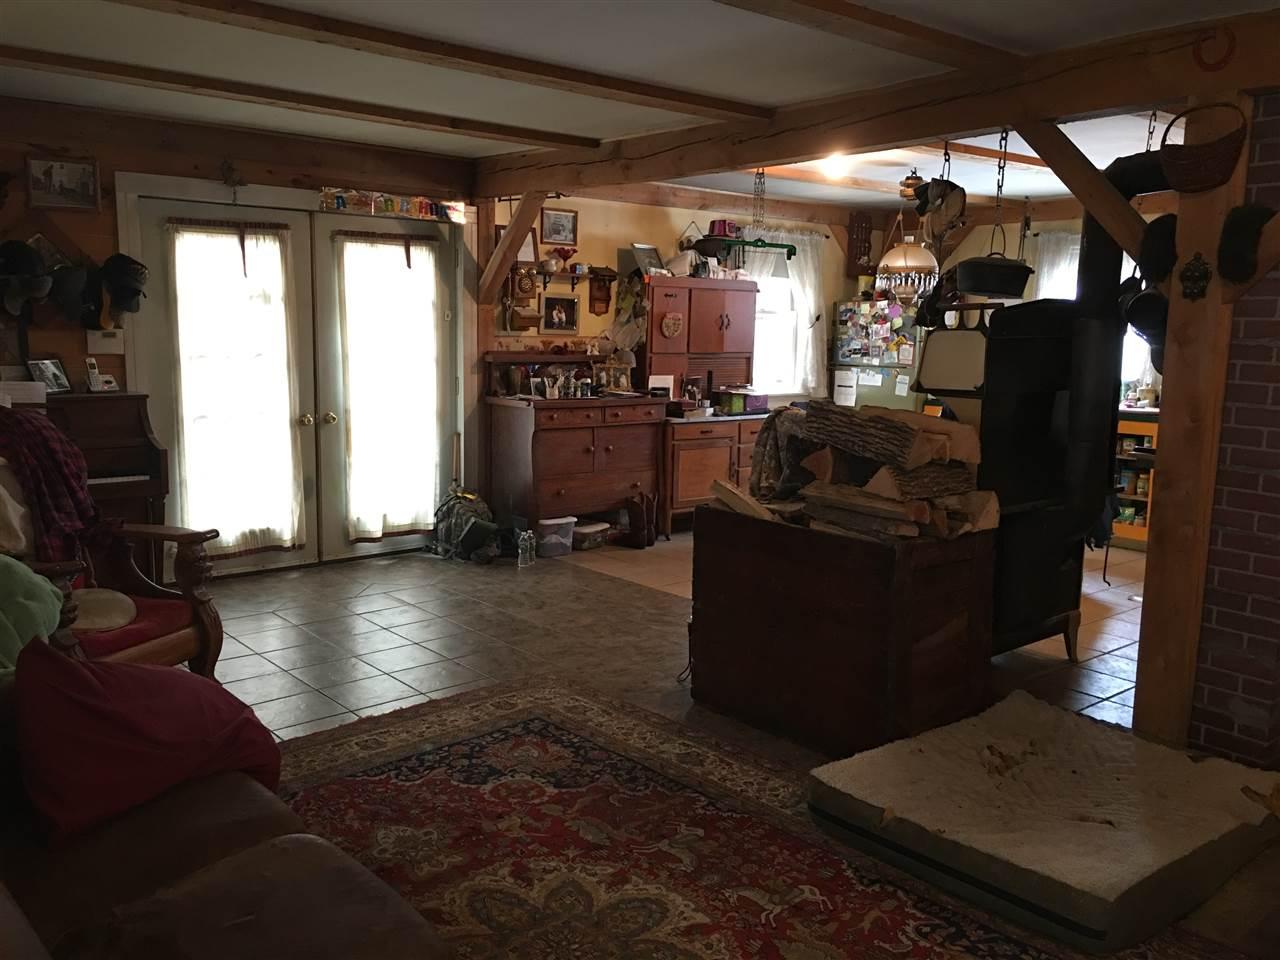 upstairs bedroom 11520556